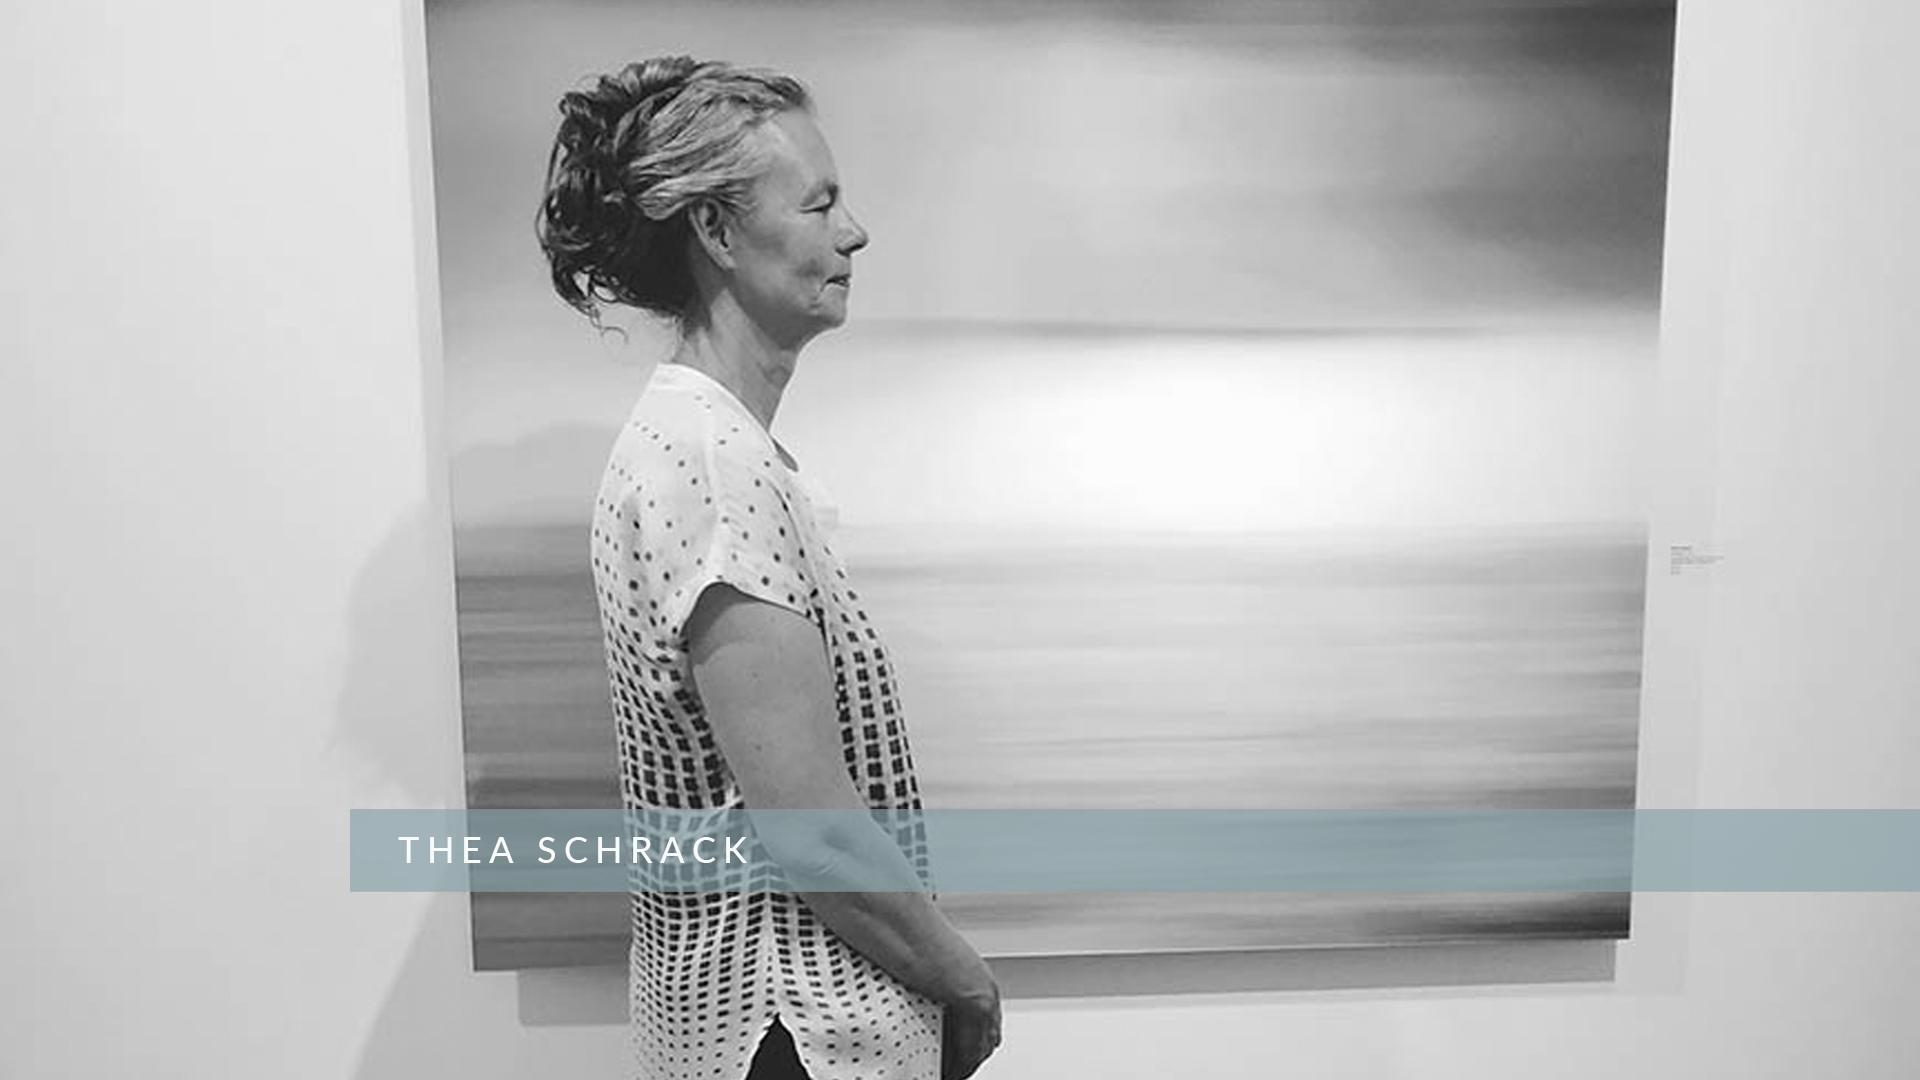 Thea Schrack